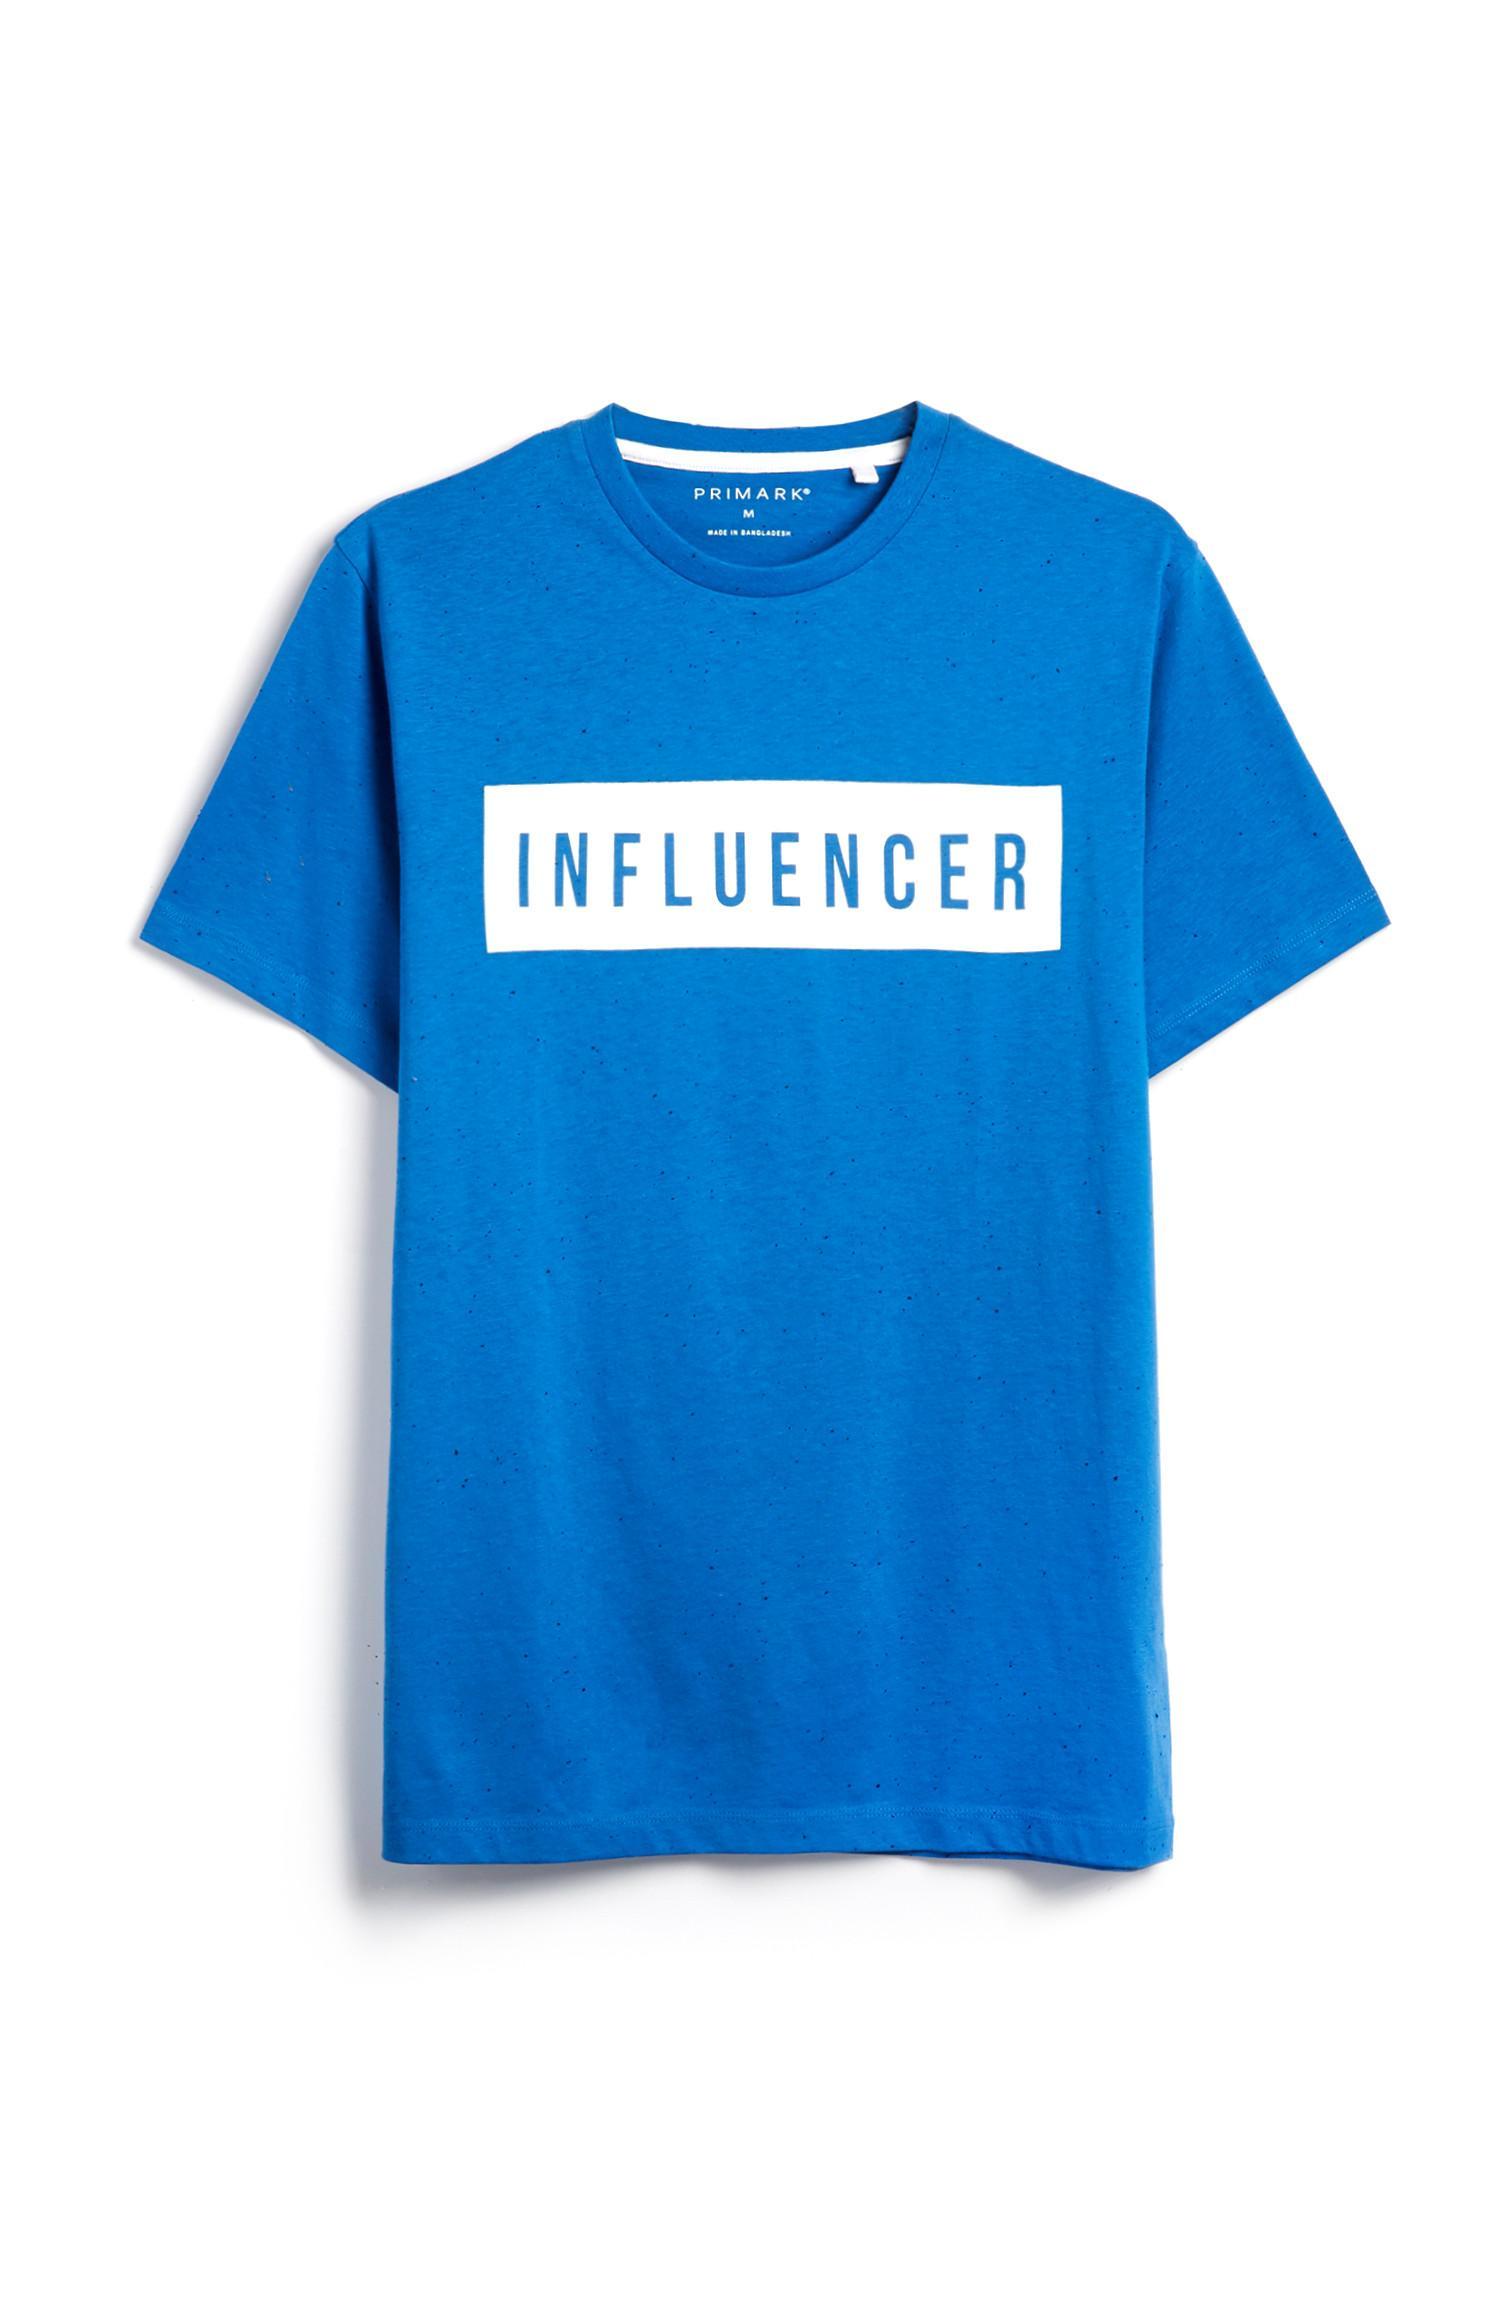 Blaues T-Shirt mit Slogan